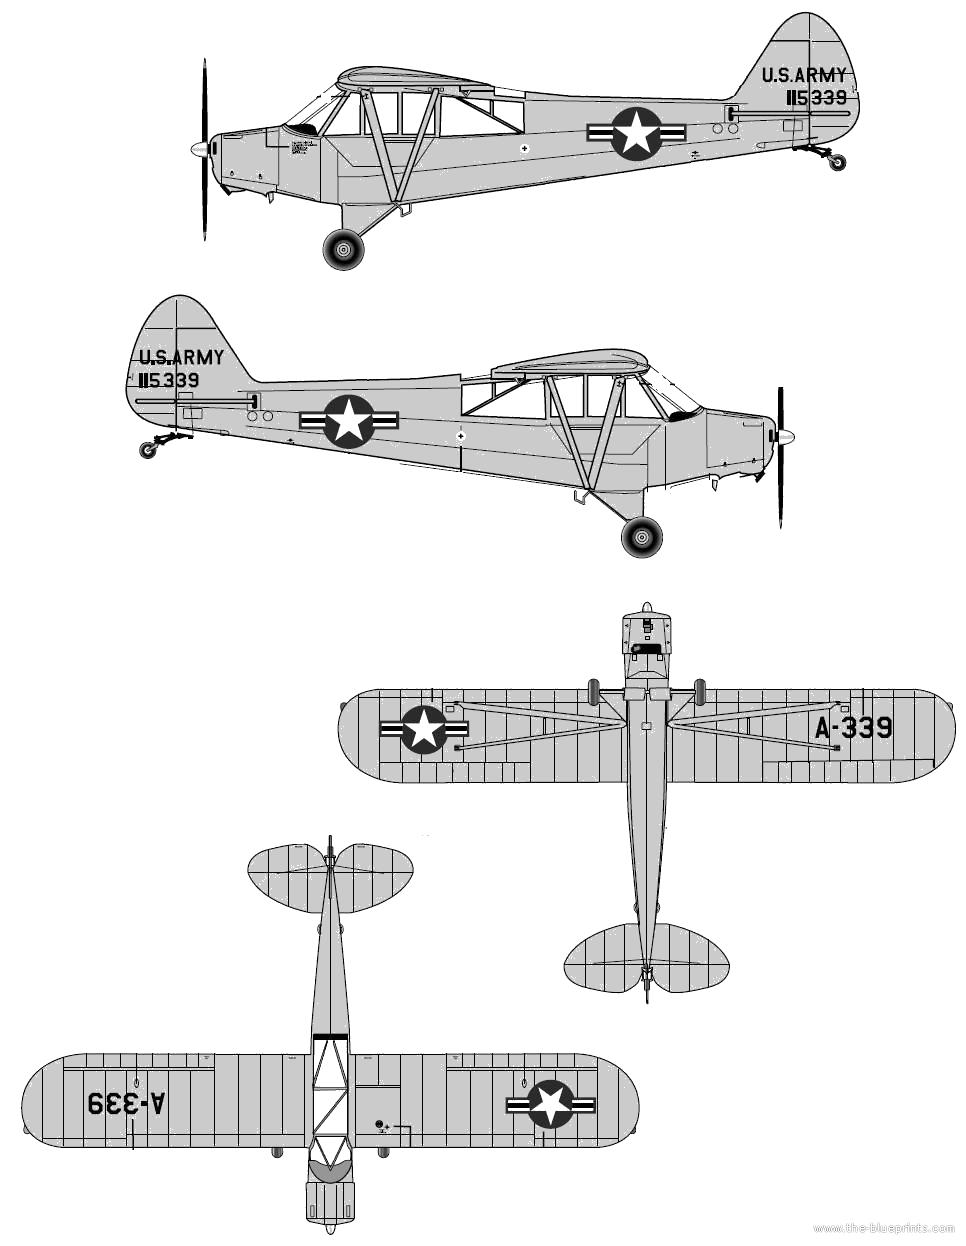 Blueprints > Modern airplanes > Piper > Piper PA-18A Super Cub